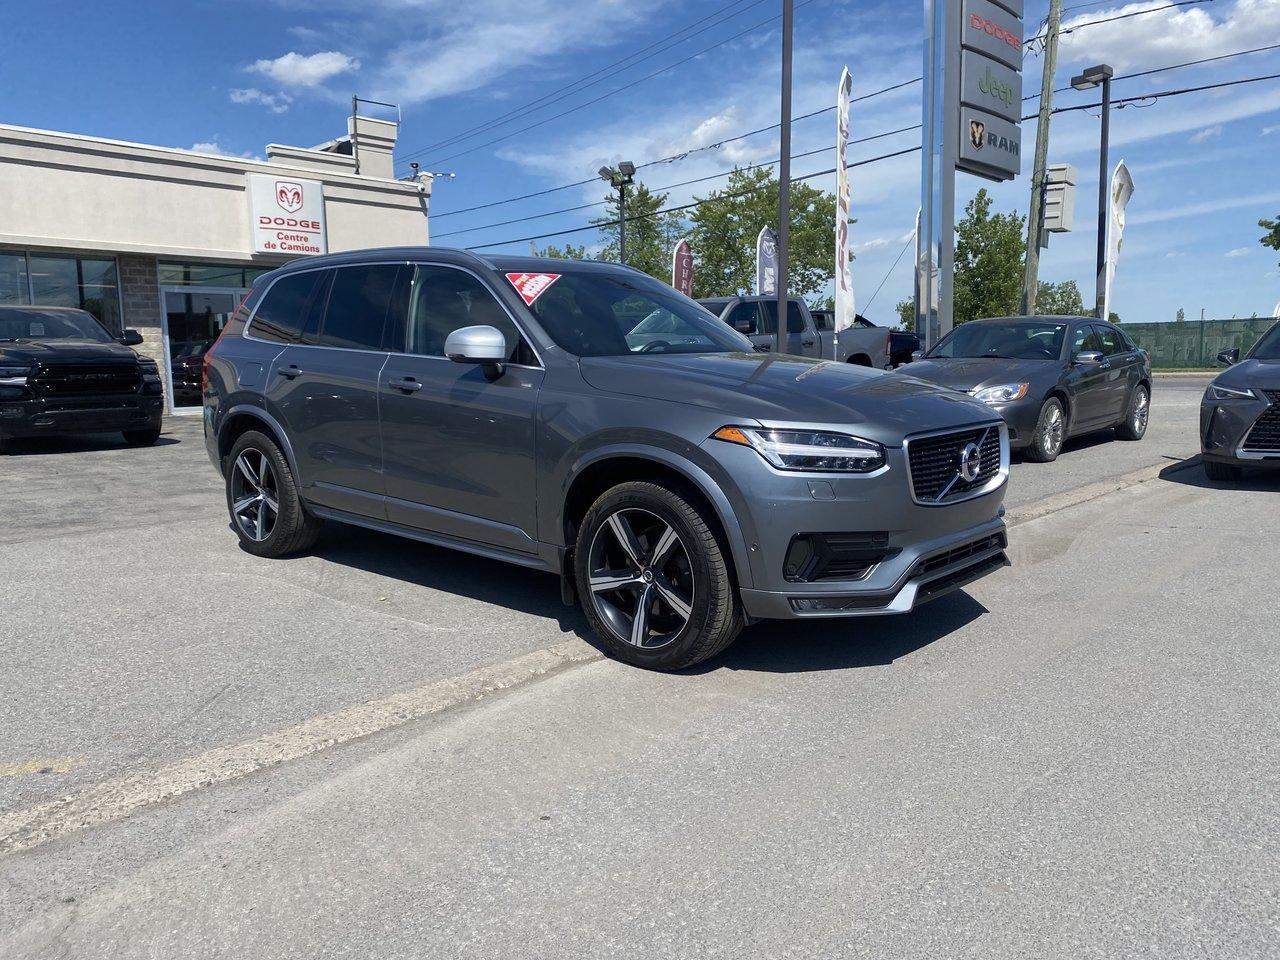 Volvo XC90 2019 T6 AWD R-Design - Harman Kardon - NAPPA - Toi